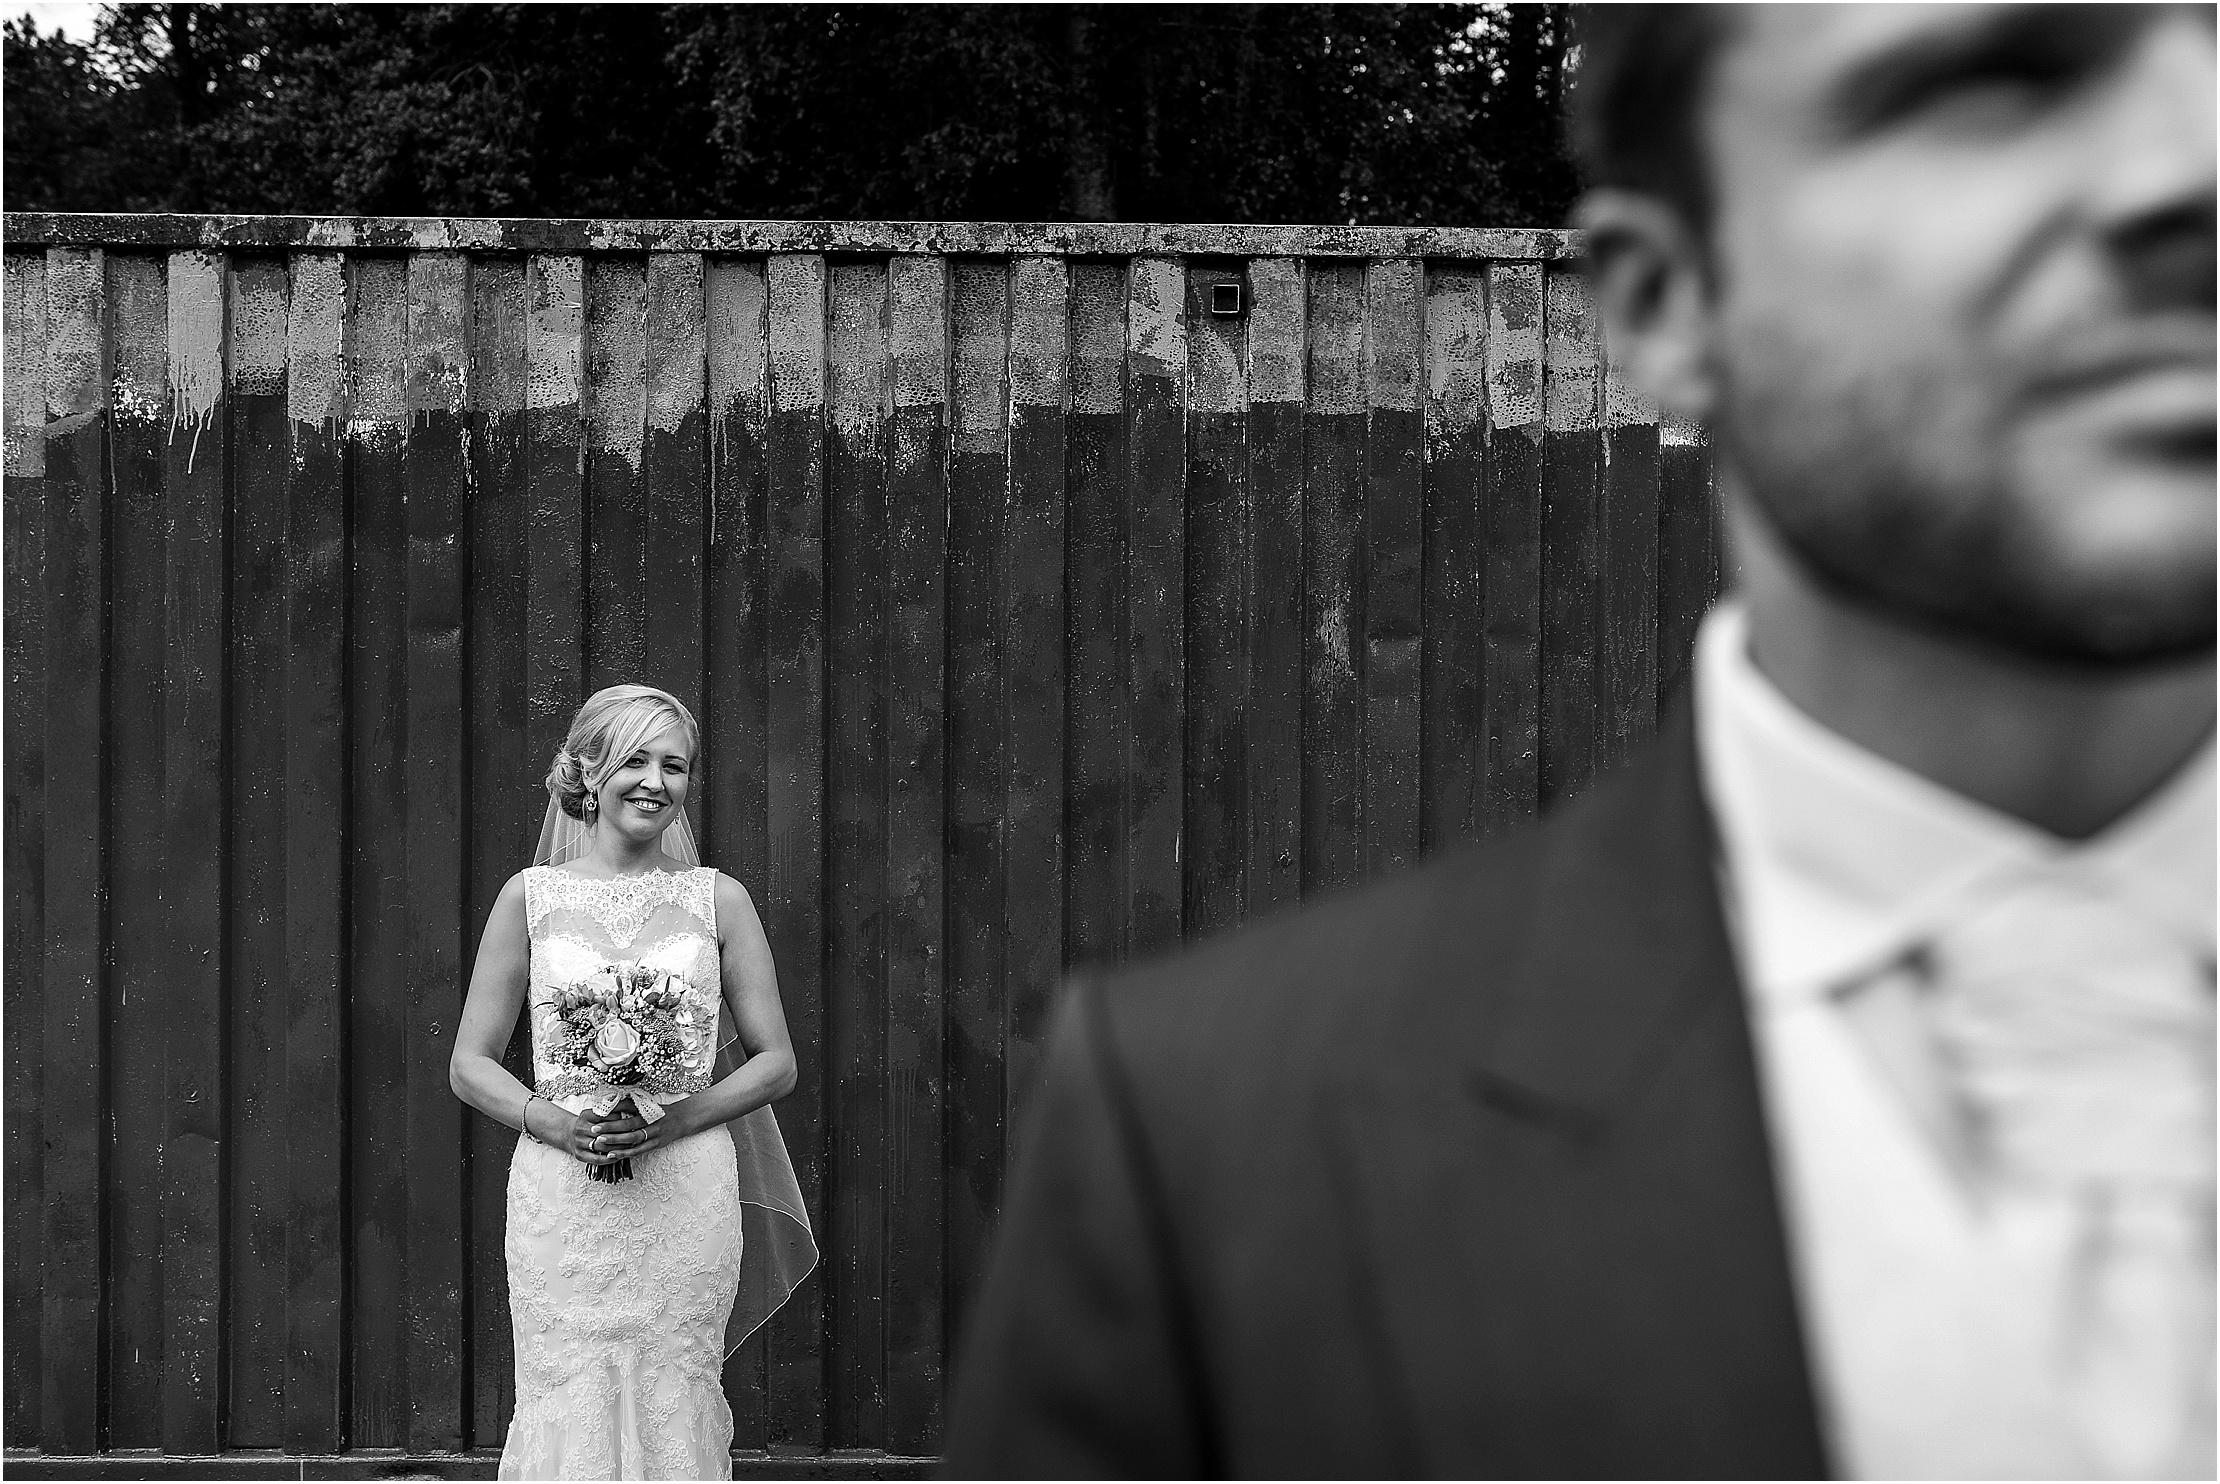 staining-lodge-wedding-087.jpg